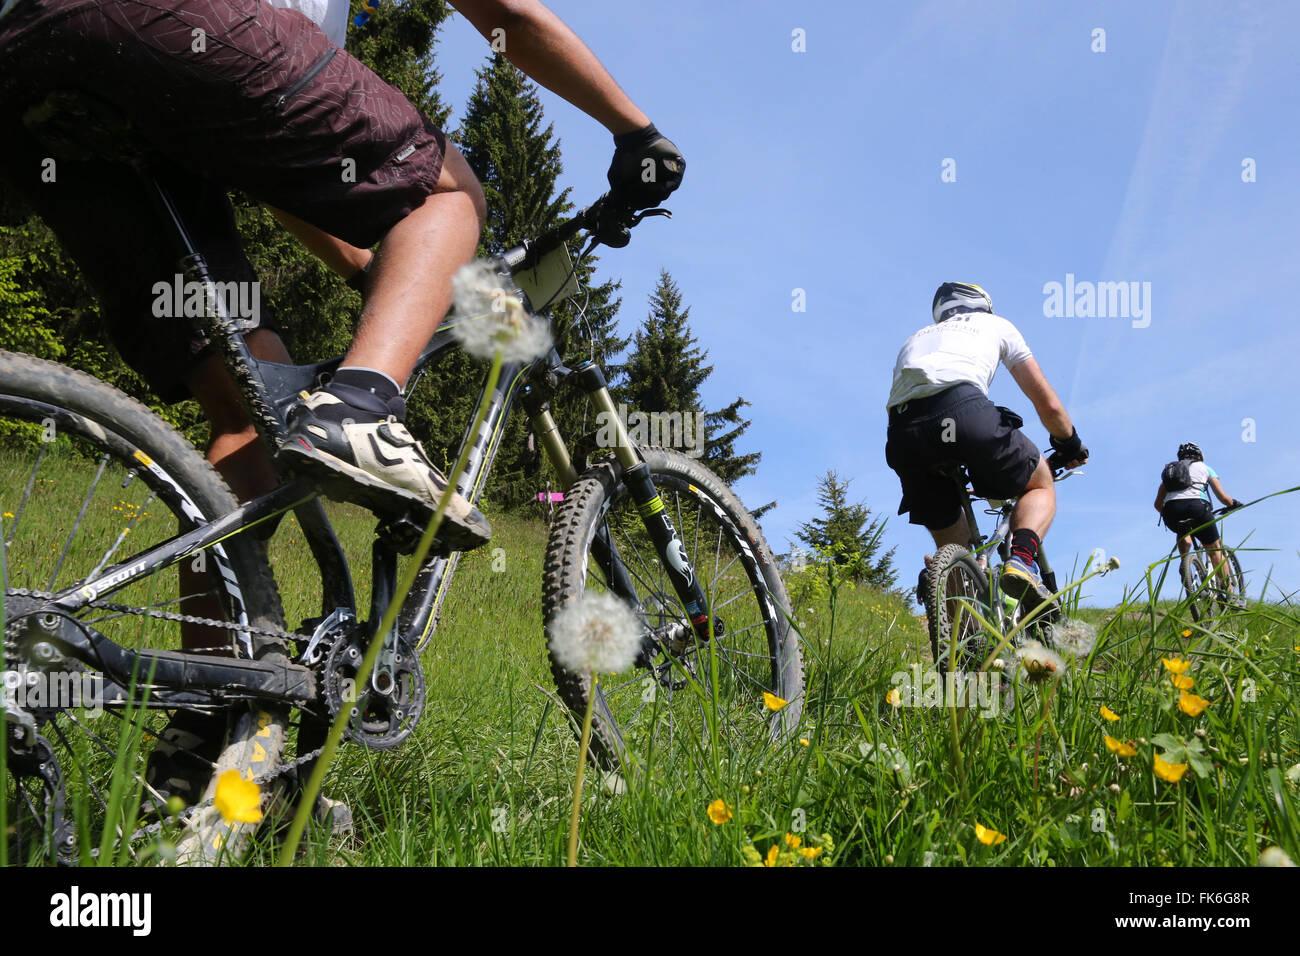 Dre Dans le l'Darbon, mountain bike race in the French Alps, Haute Savoie, France, Europe - Stock Image